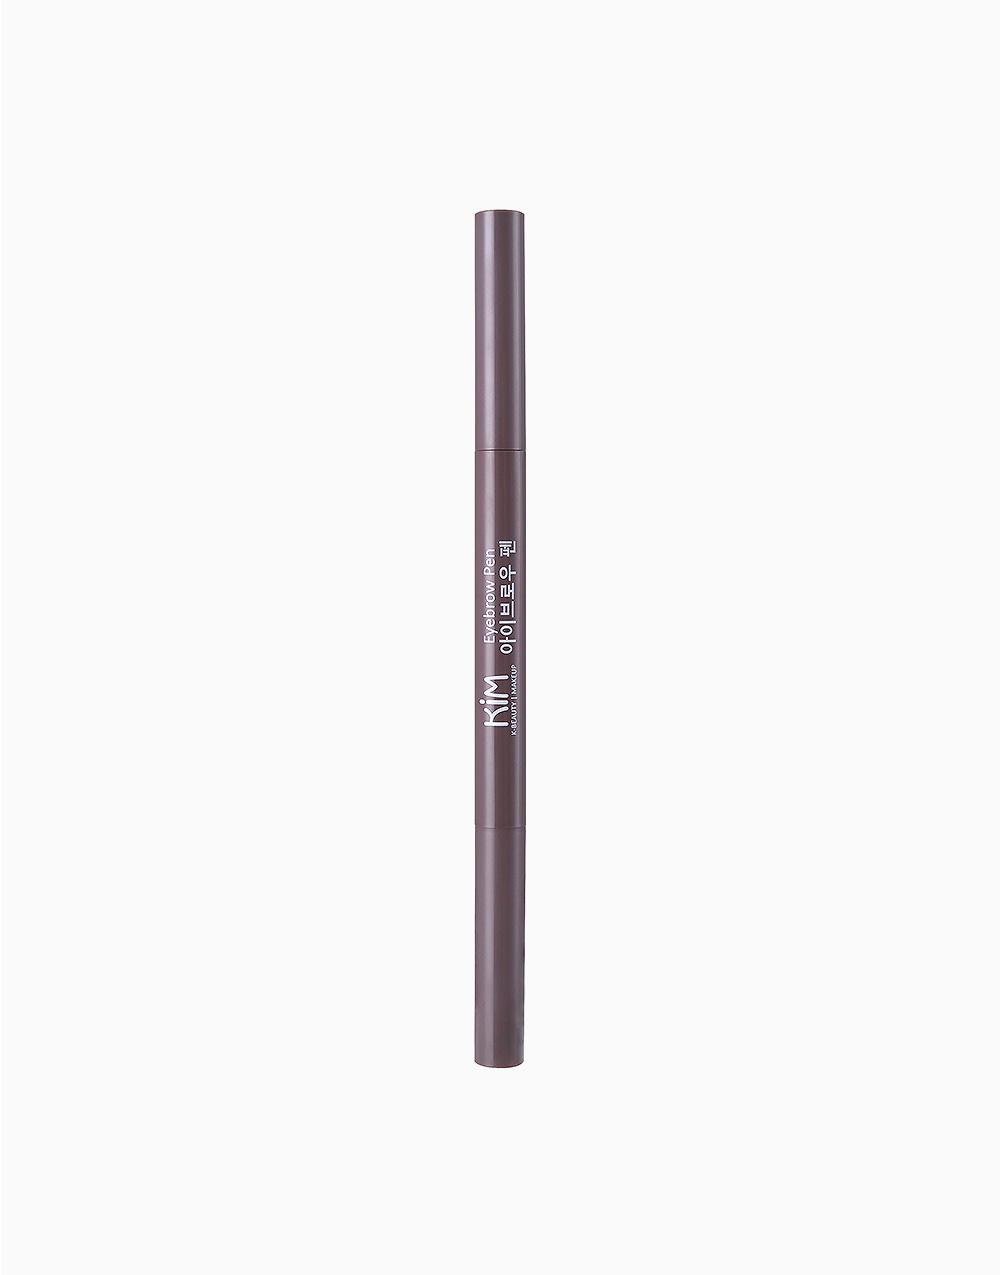 Auto Eyebrow Pen with Brush by Kim Korean Beauty   Gray Brown